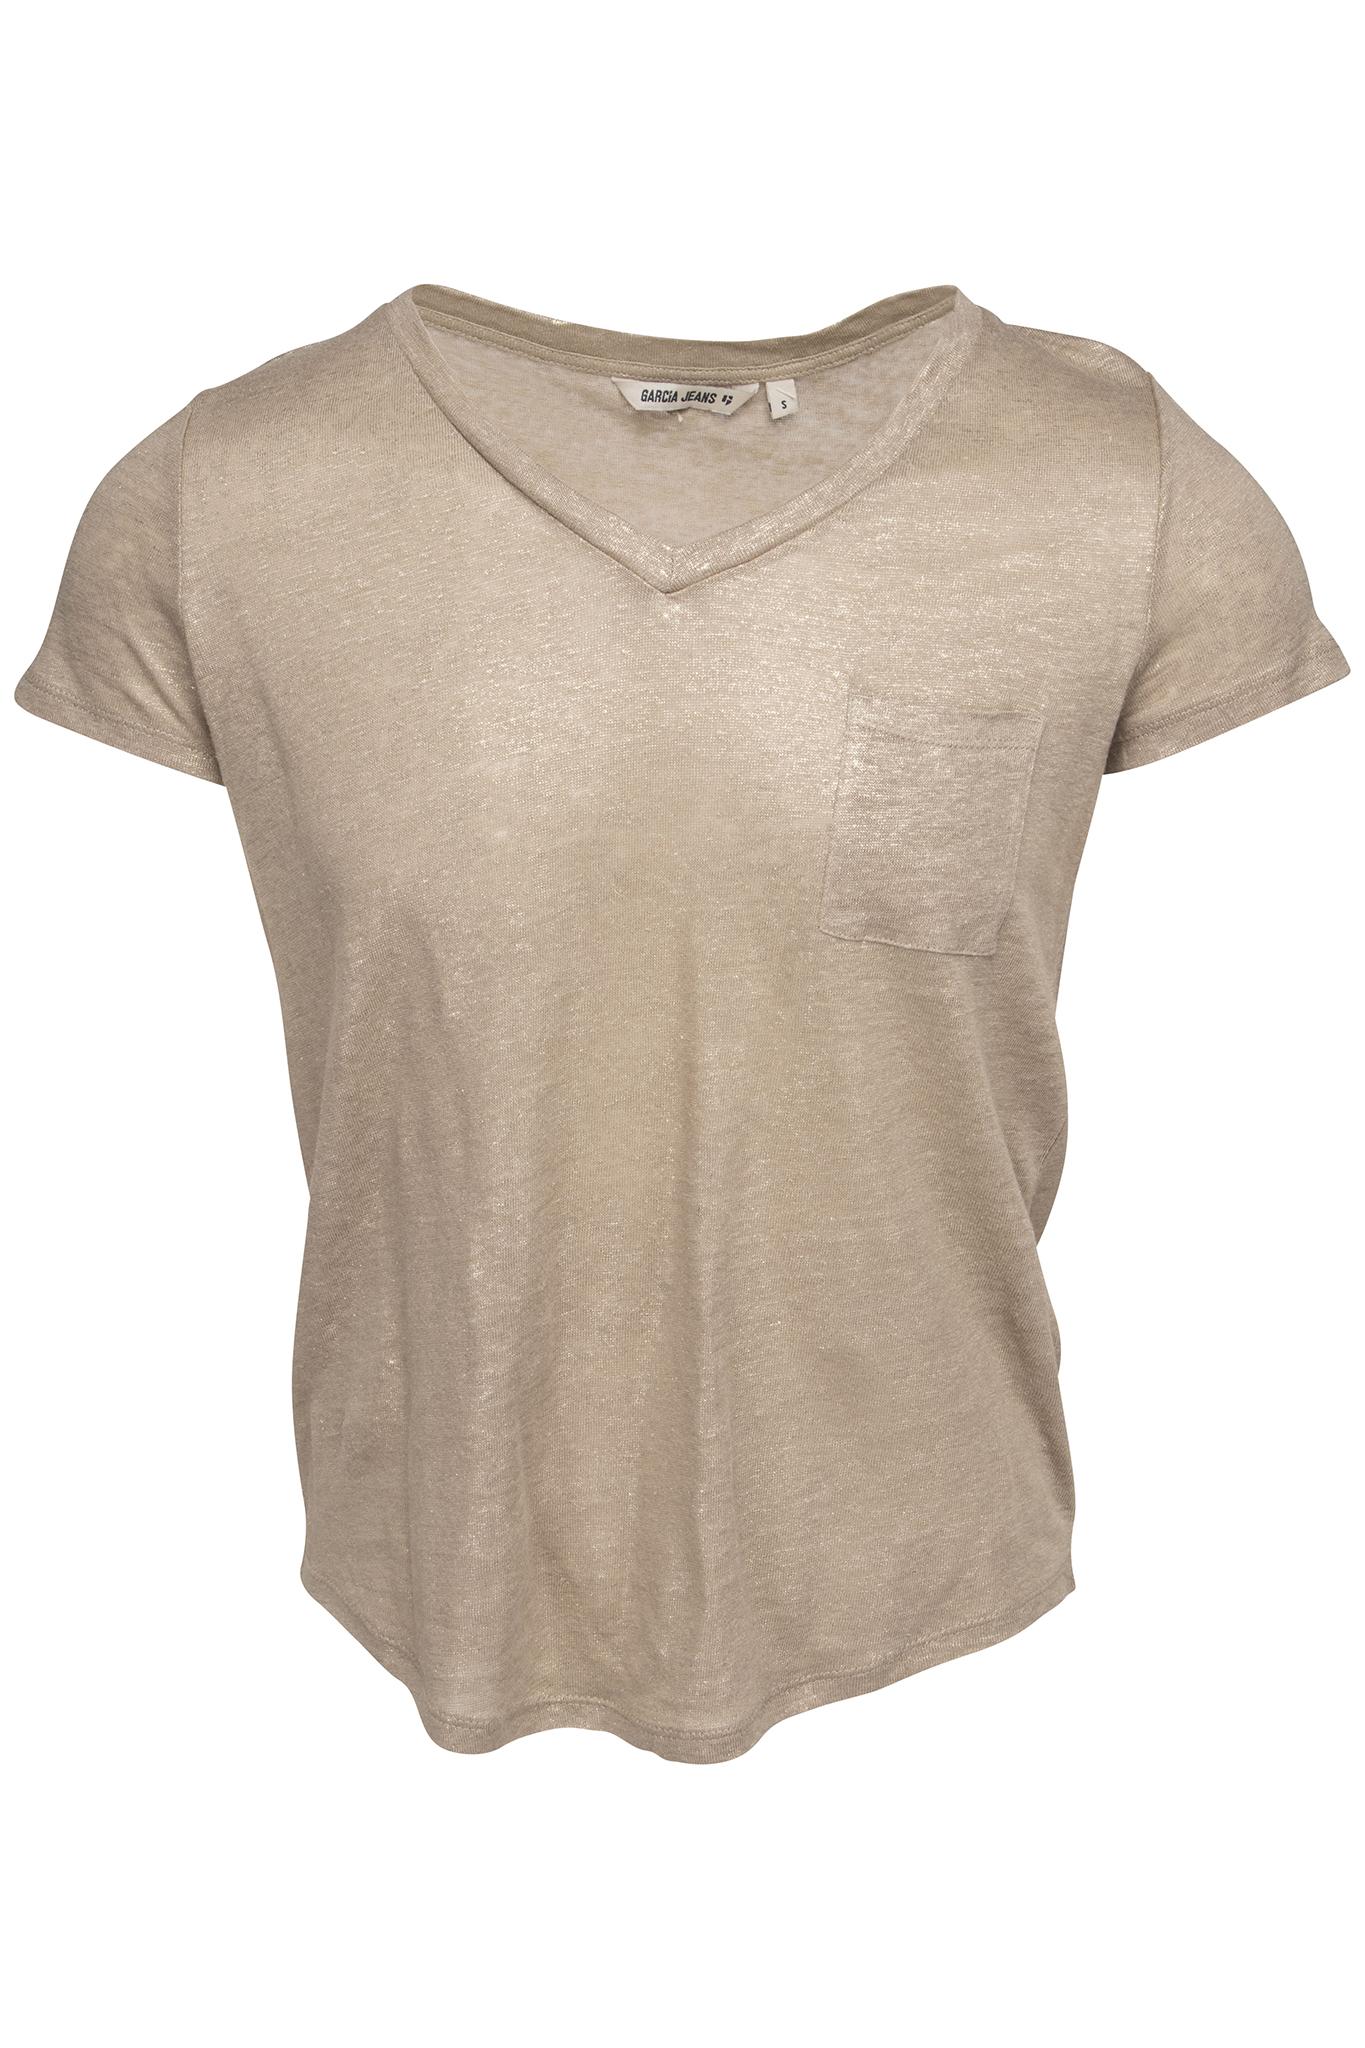 Goud beige dames shirt Garcia - P80213